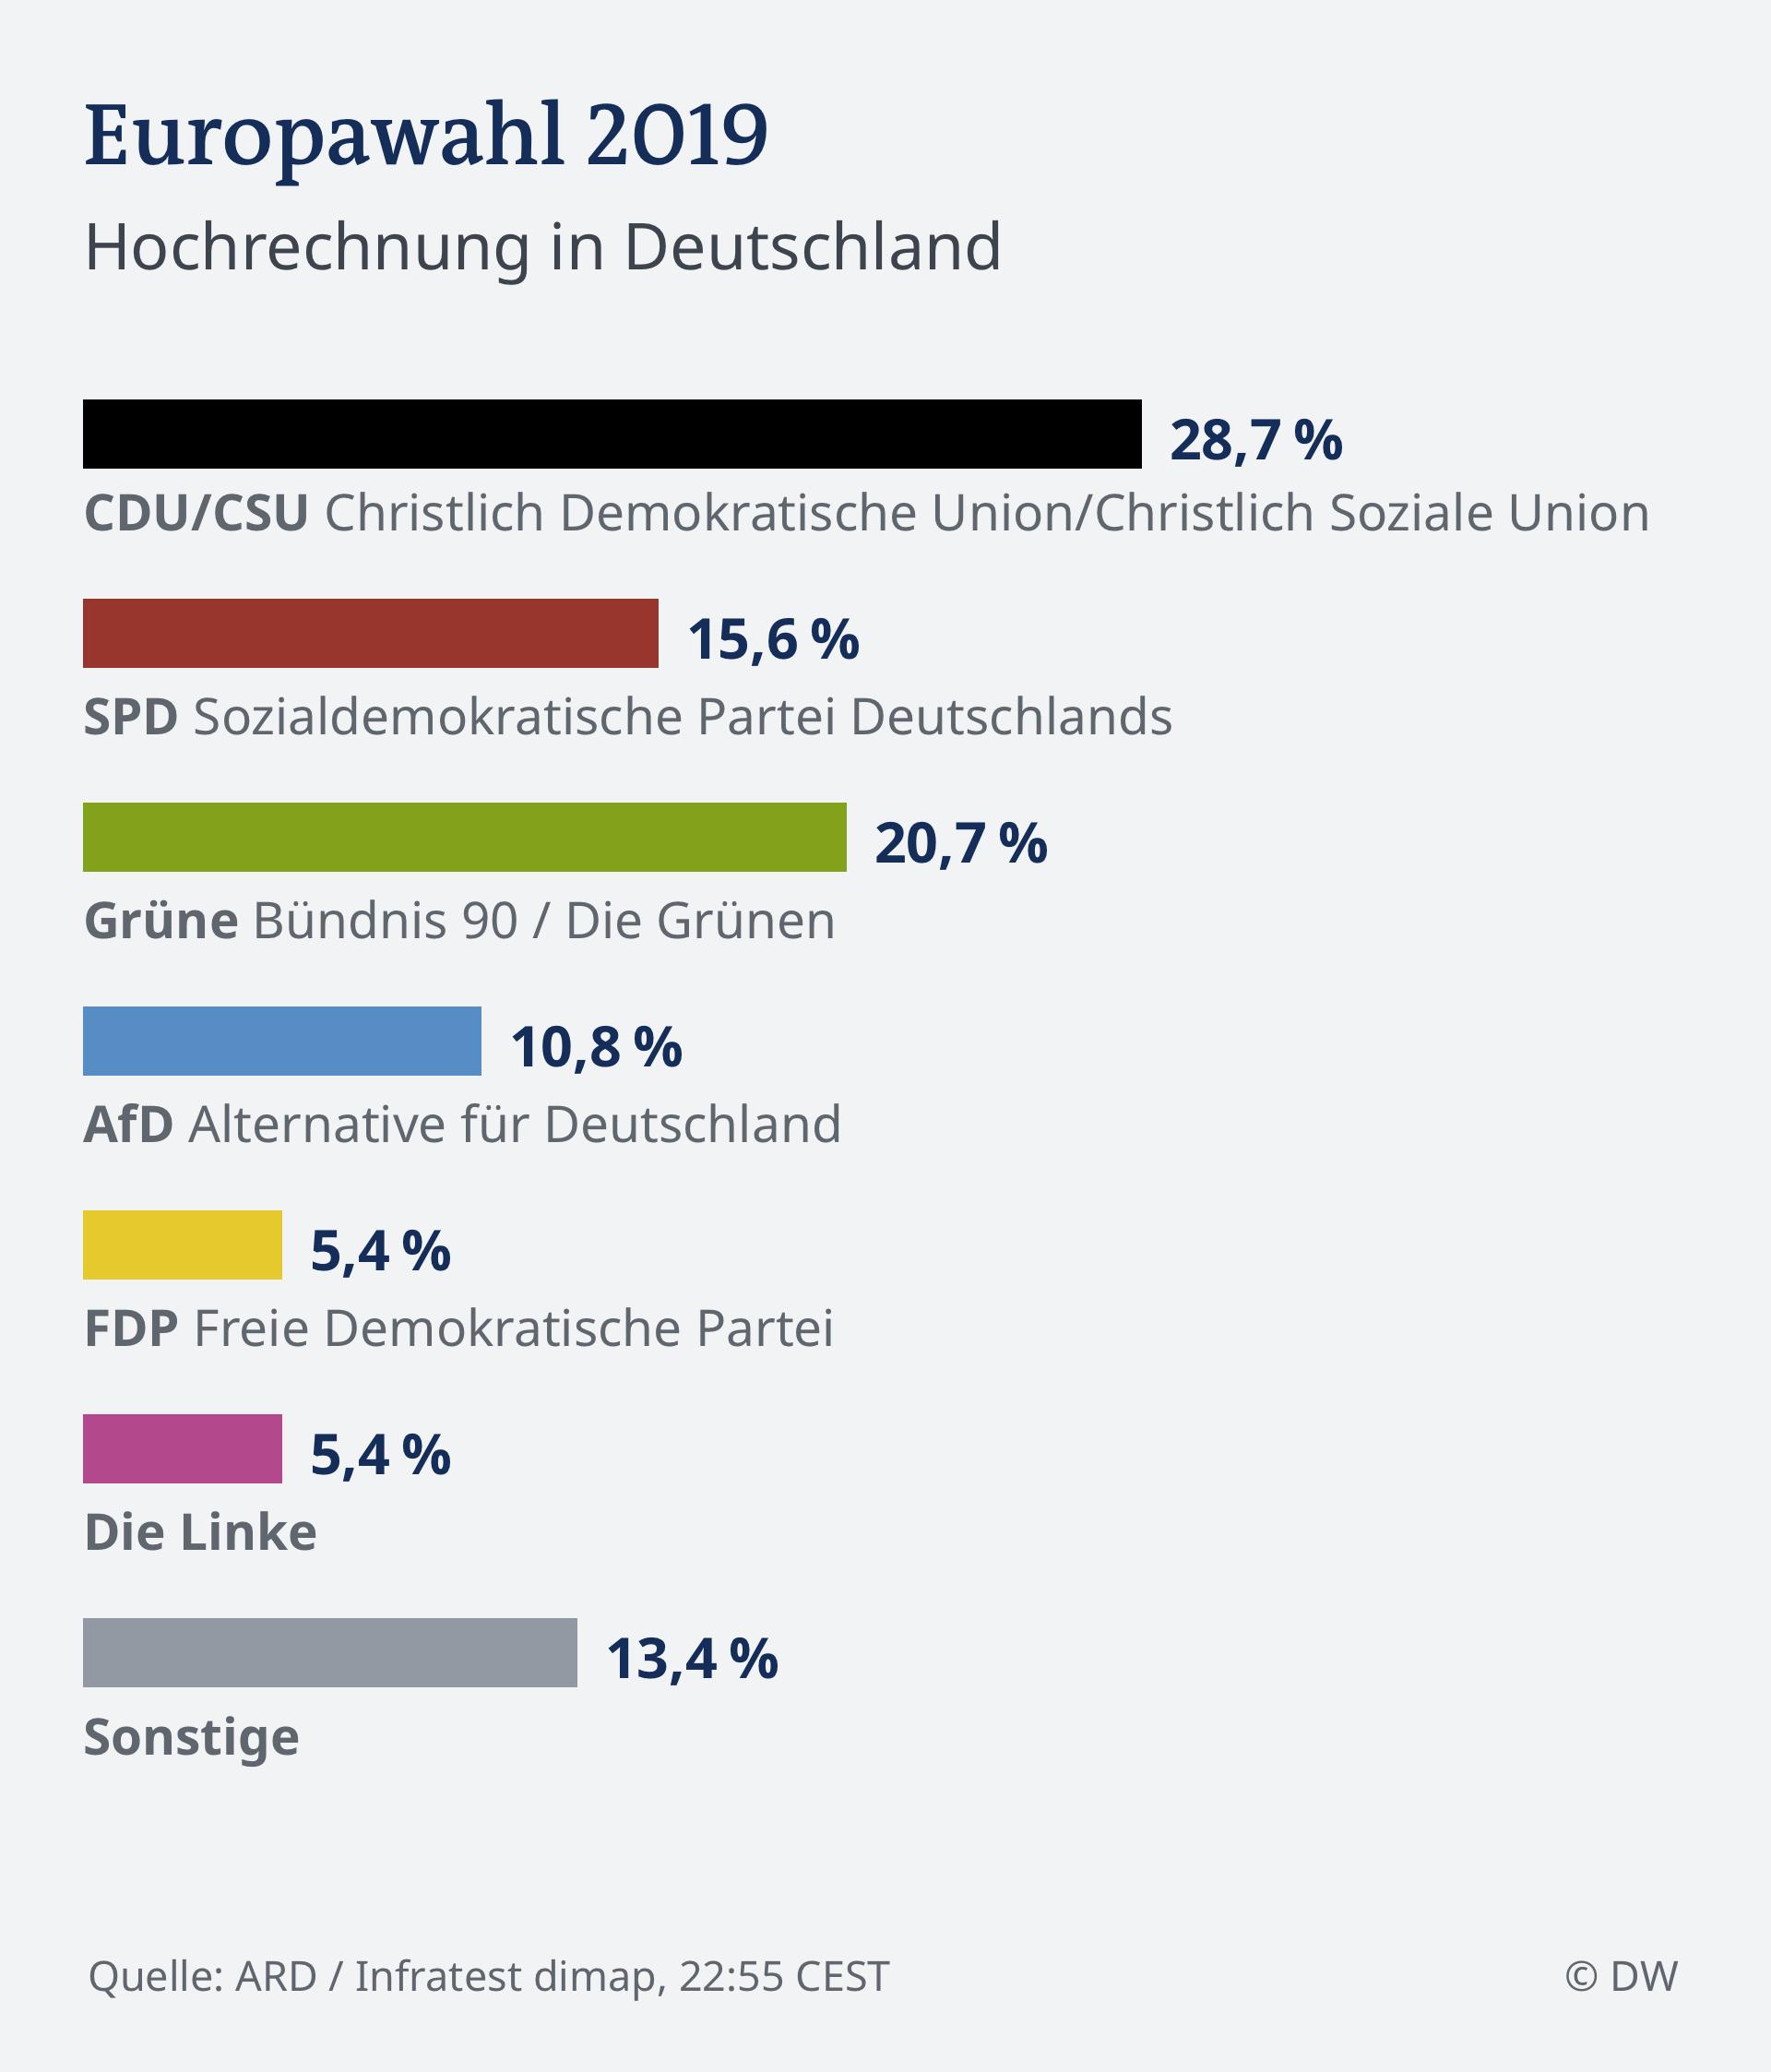 Infografik HOCHRECHNUNG 22.55 EU Wahl 2019 - Deutschland DEU